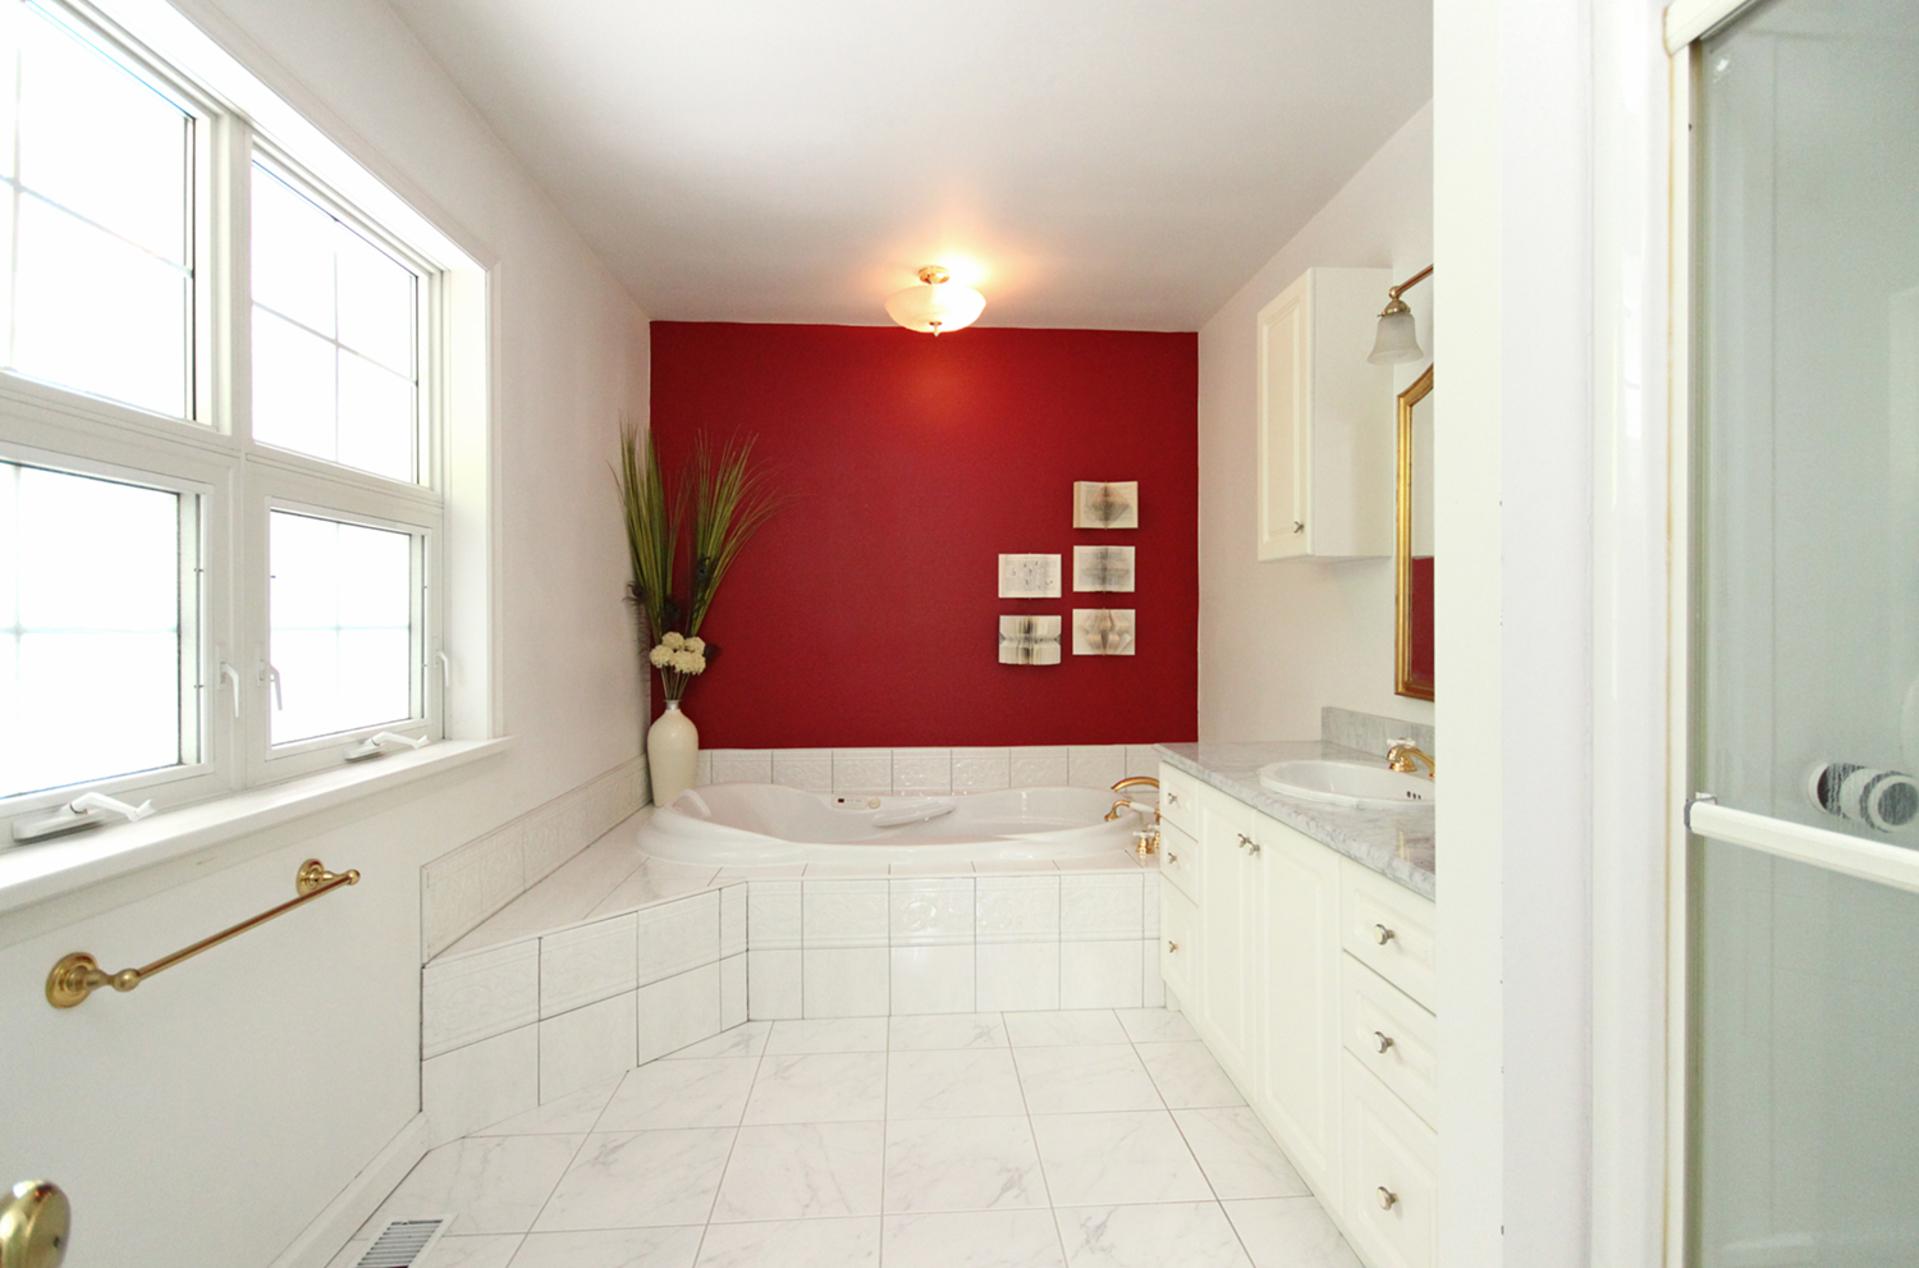 4 Piece Ensuite Bathroom at 128 Cassandra Boulevard, Parkwoods-Donalda, Toronto